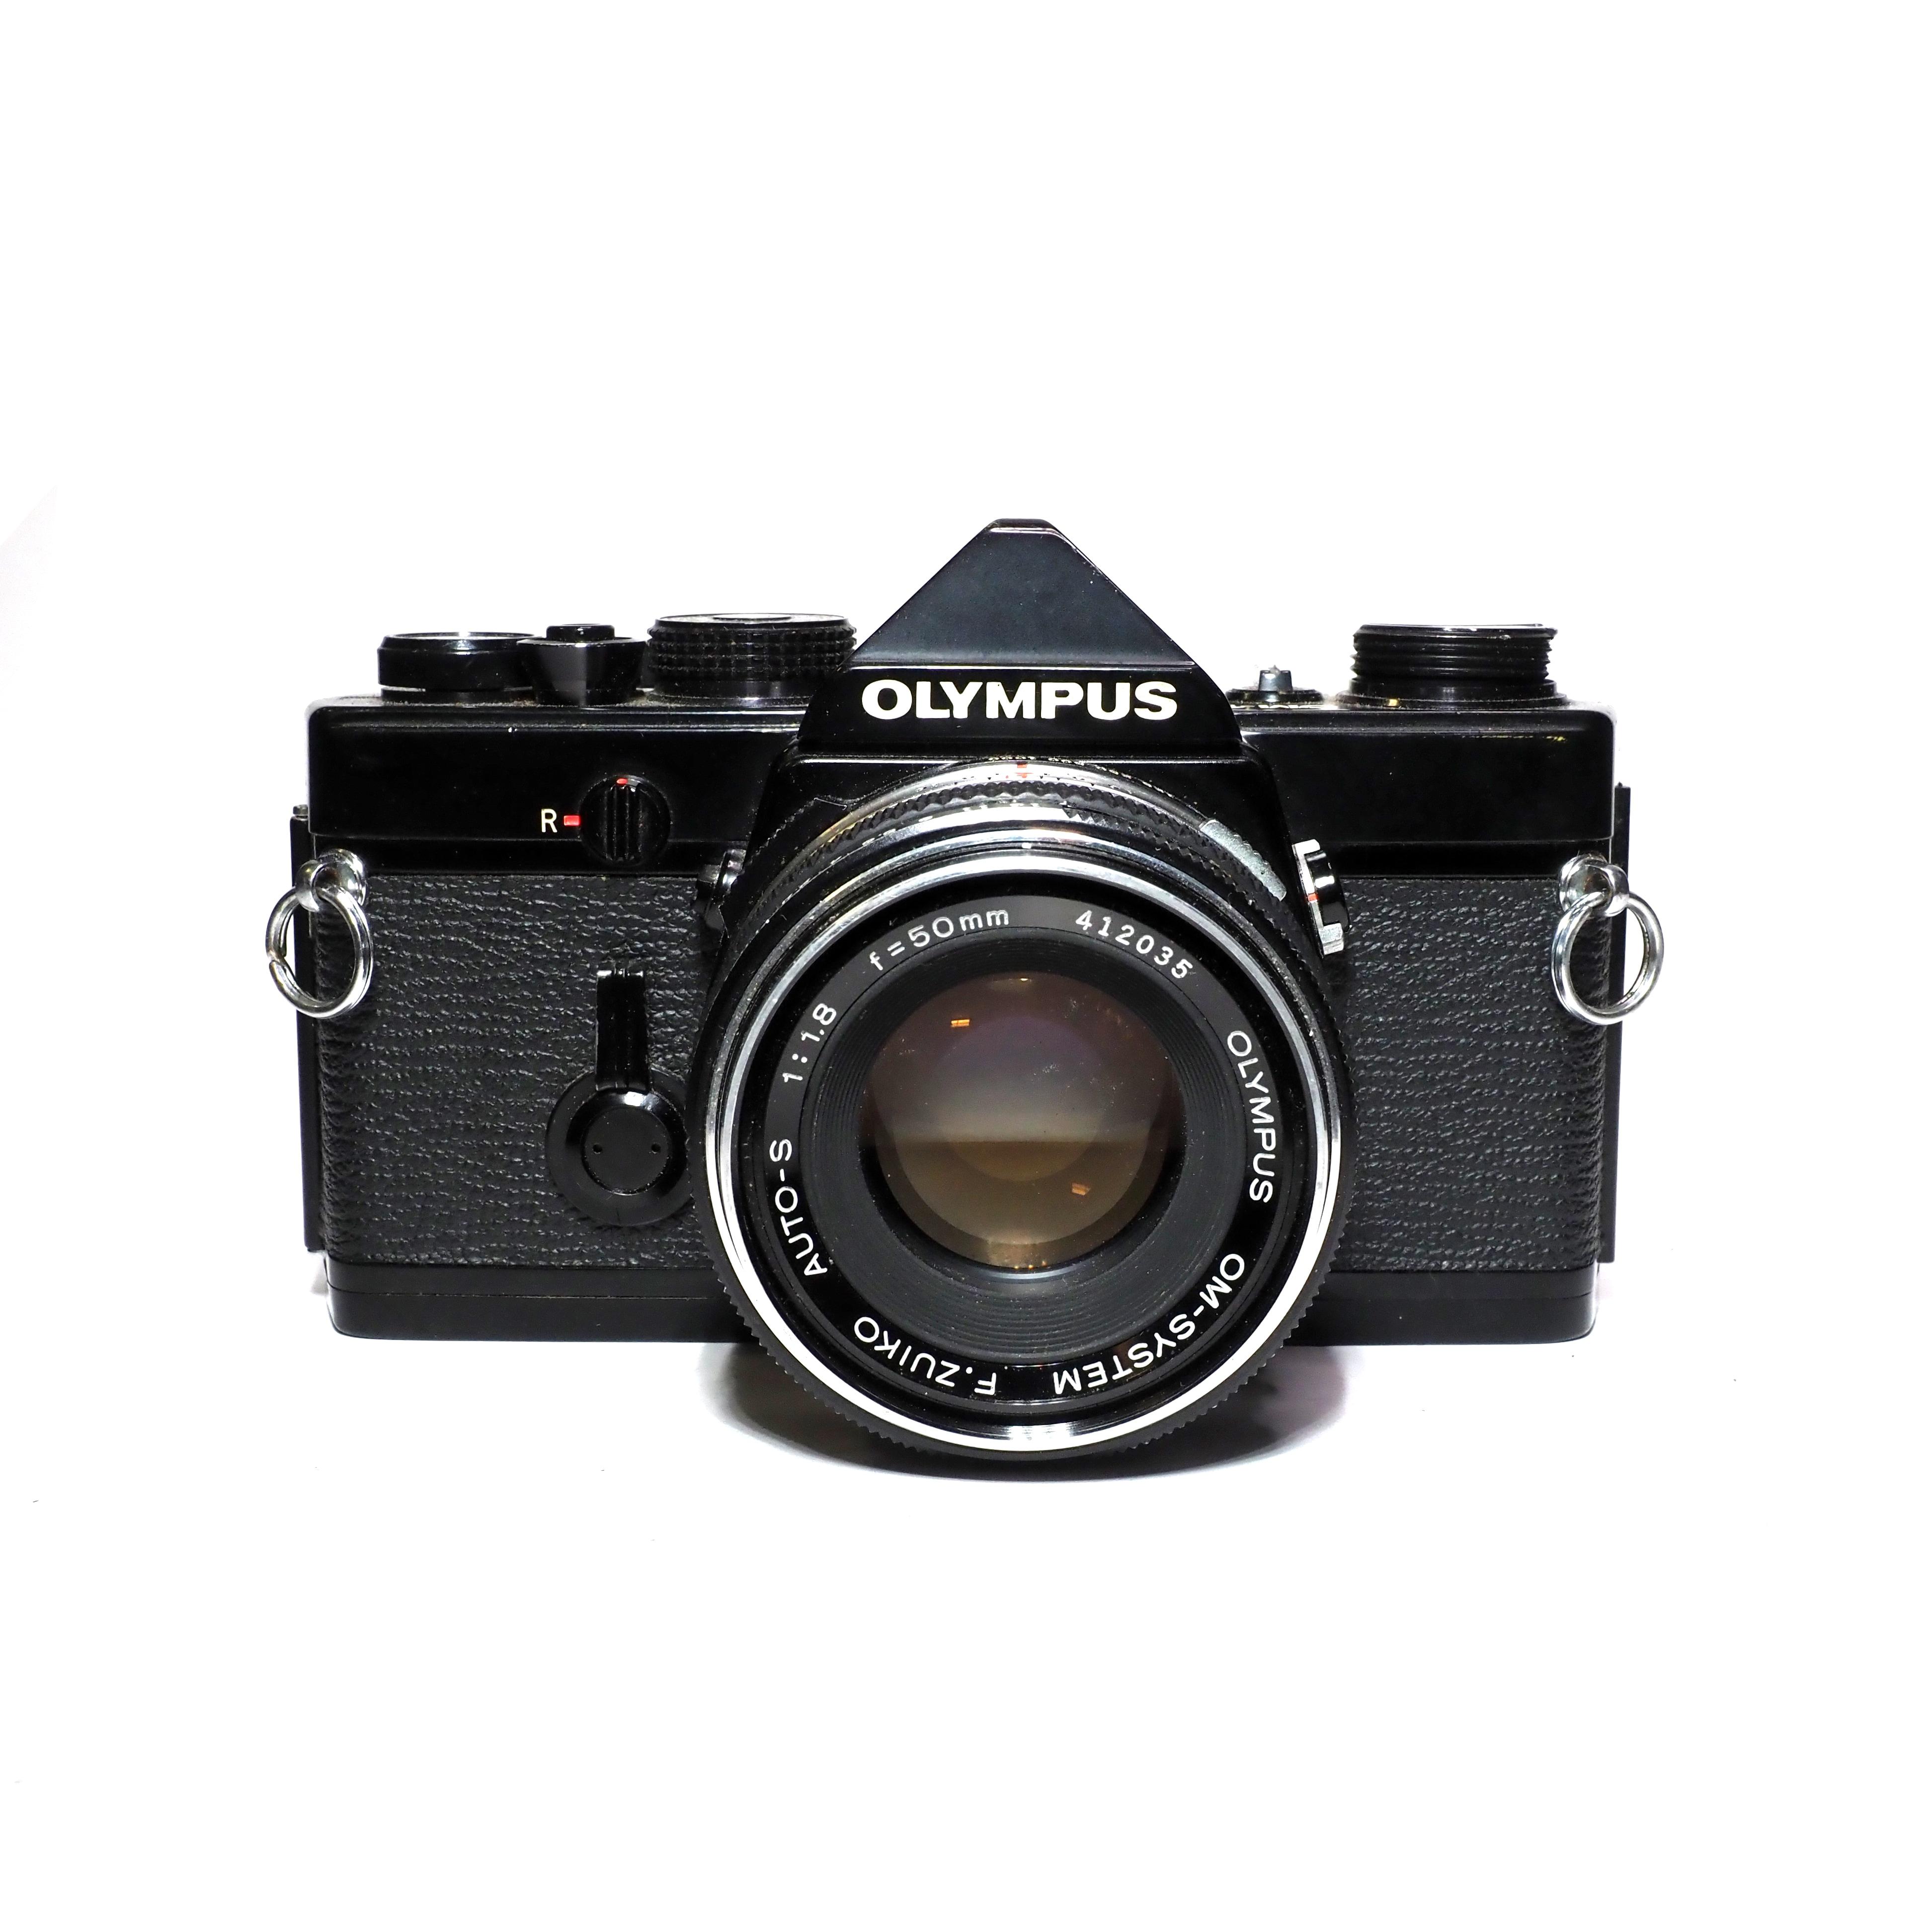 Olympus OM-1 inkl. F.Zuiko 50mm f/1,8 - BEGAGNAT